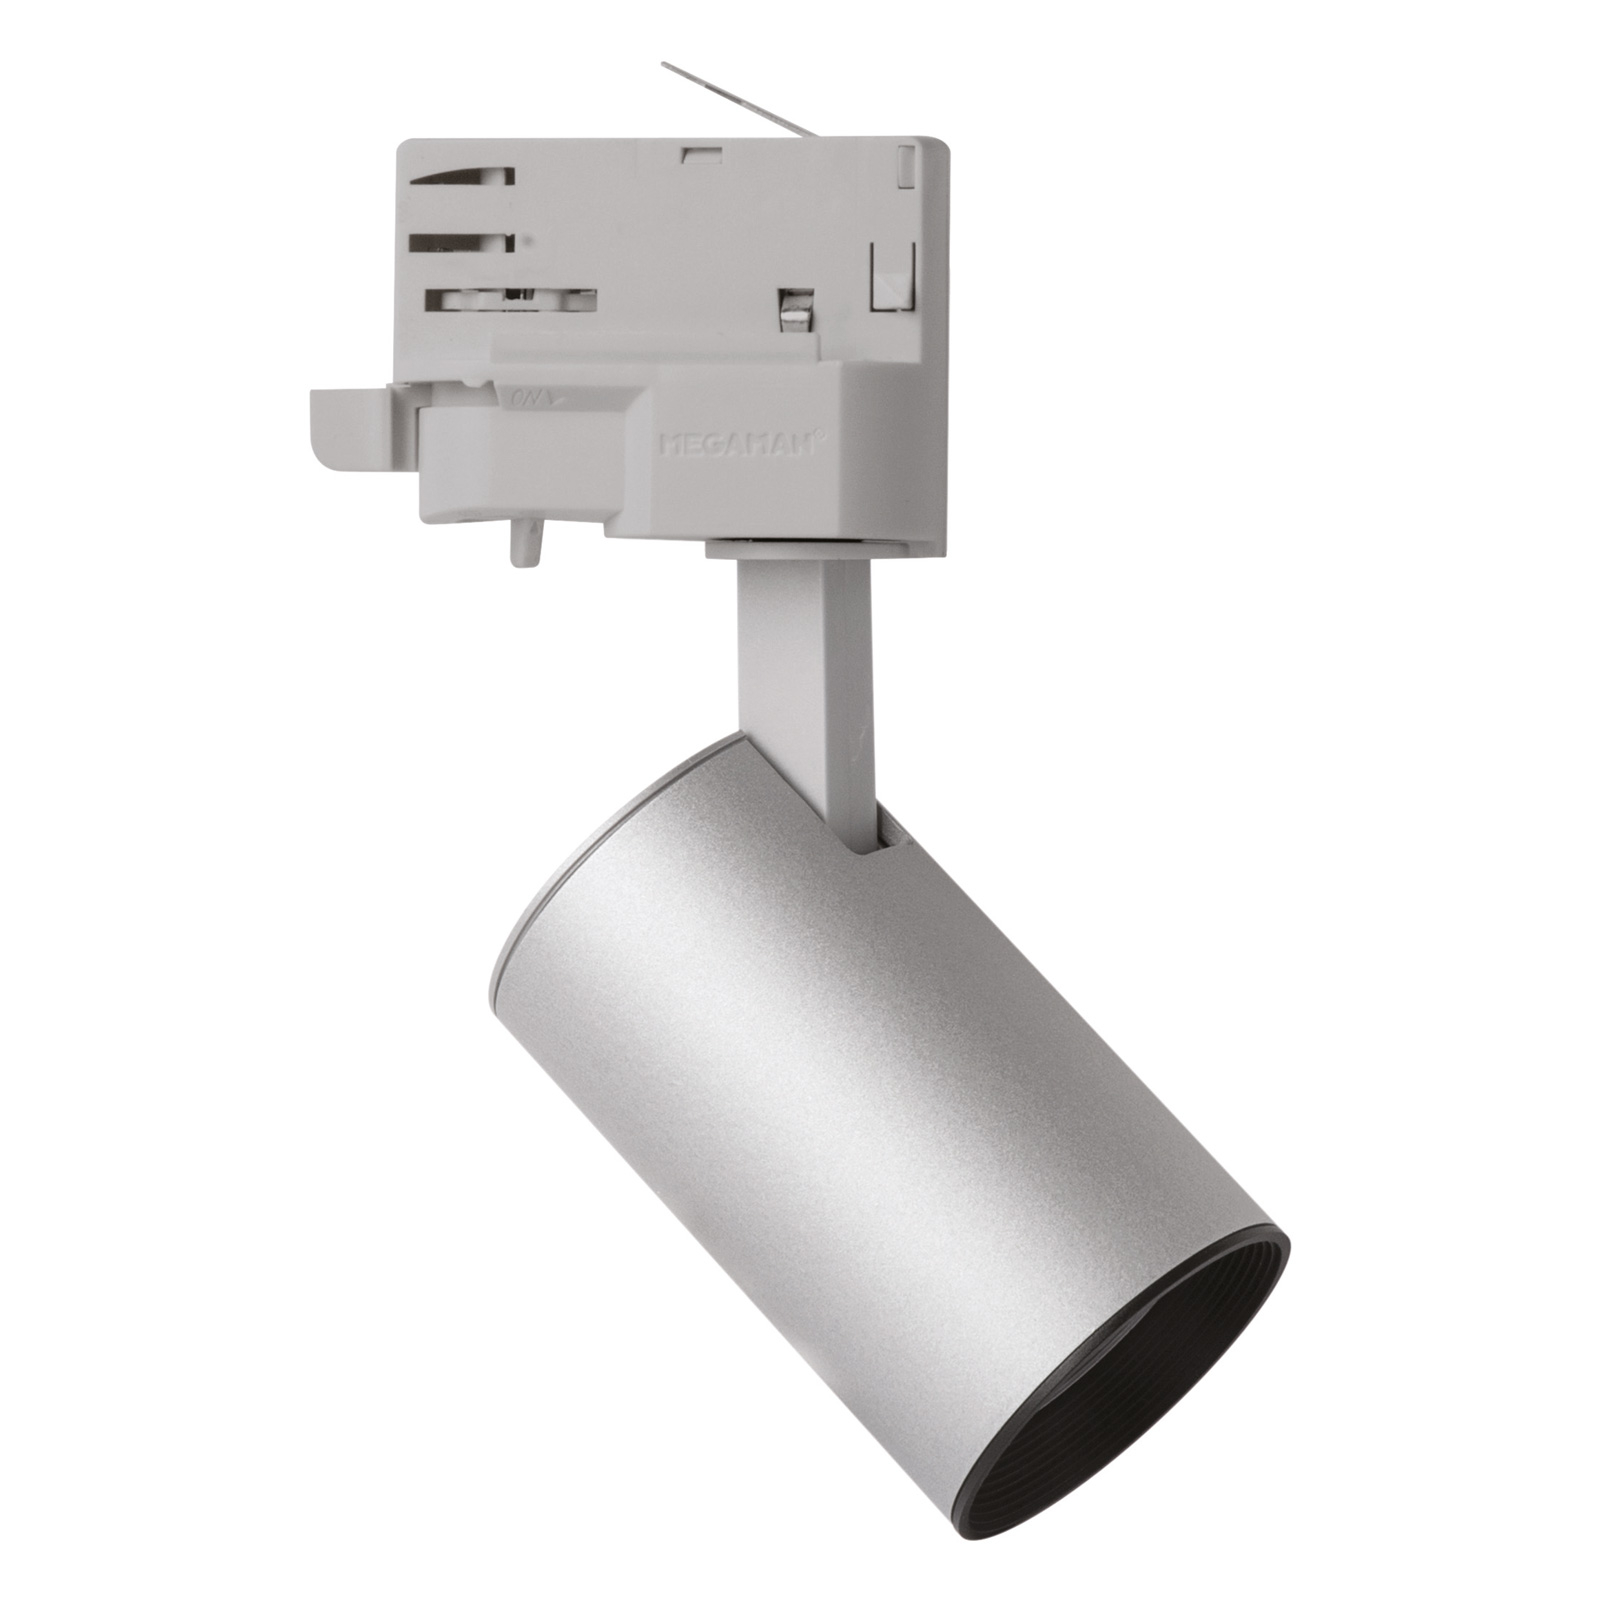 LED spot MarcoMini 3-fase-rail zilver 4.000K